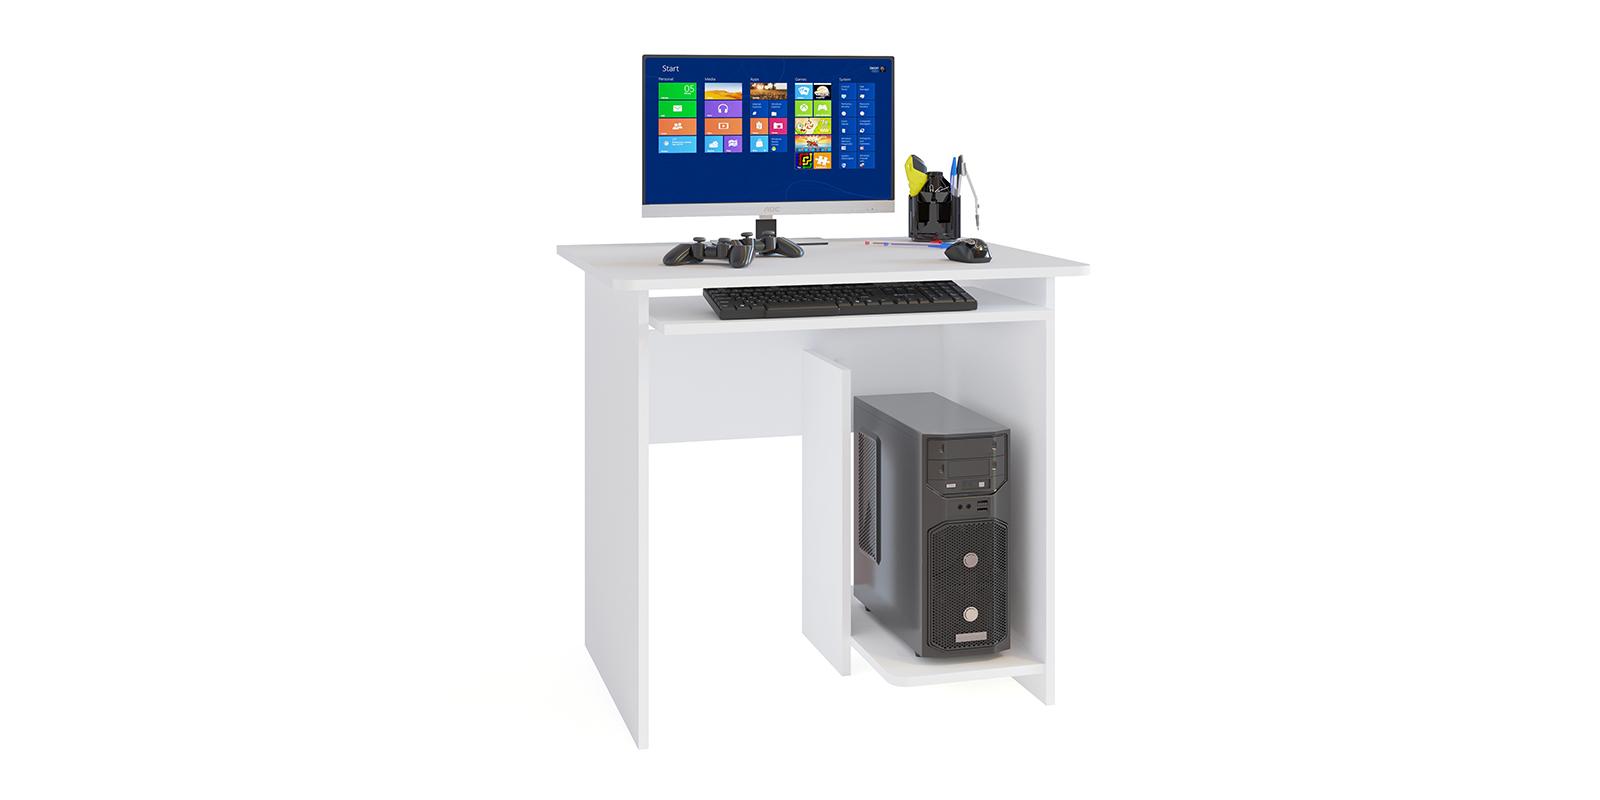 Стол компьютерный Сноу Стол компьютерный Сноу вариант №3 (белый)